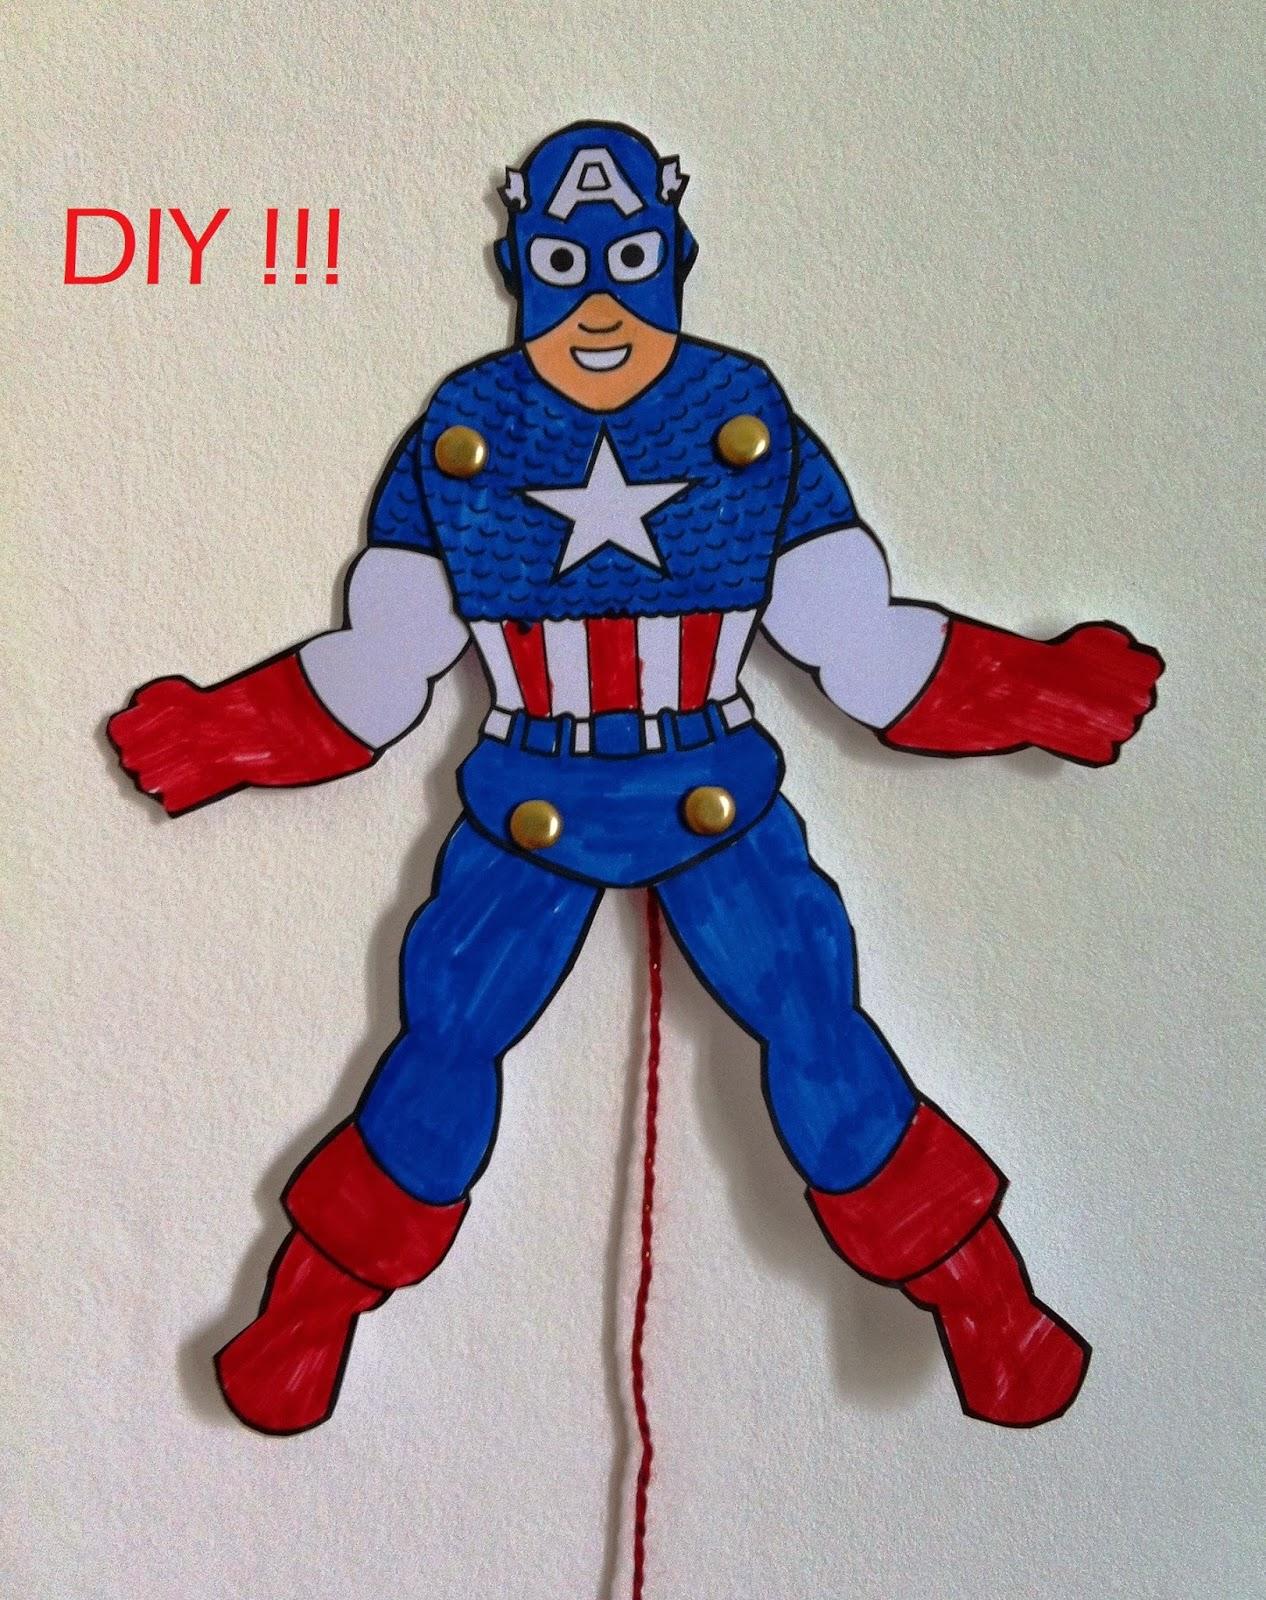 Diy des super h ros imprimer et colorier - Masque de super heros a imprimer ...